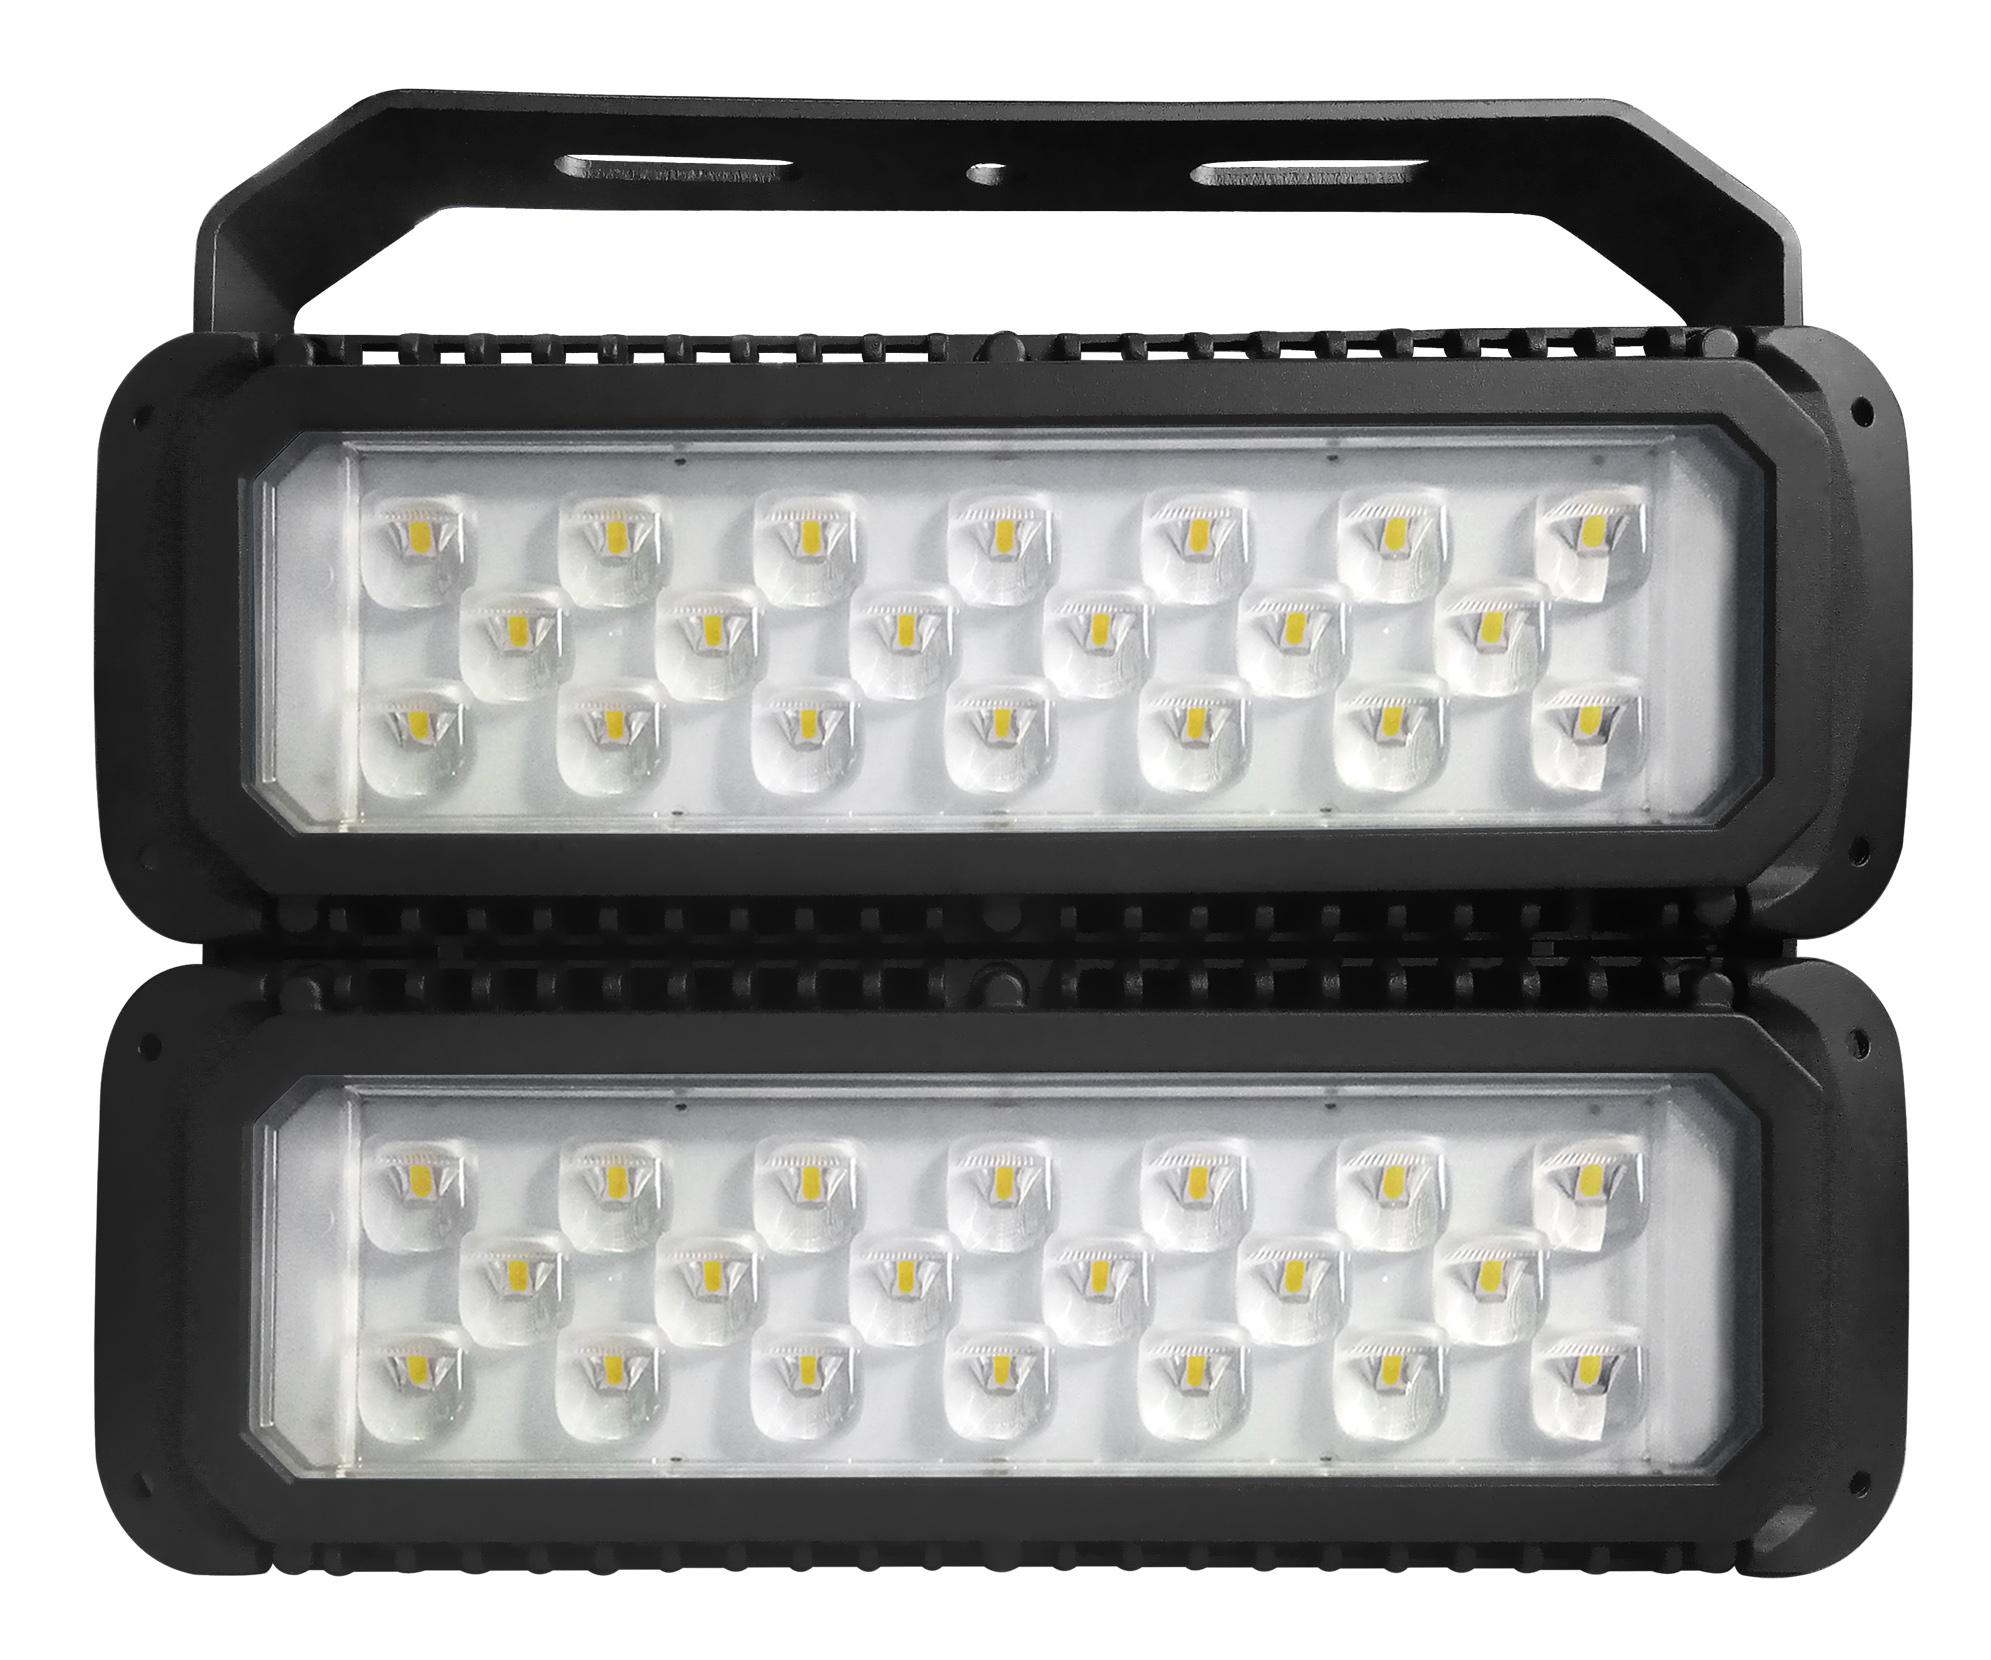 LED Fluter Maltos 150Watt mit asymmetrischen Abstrahlwinkel